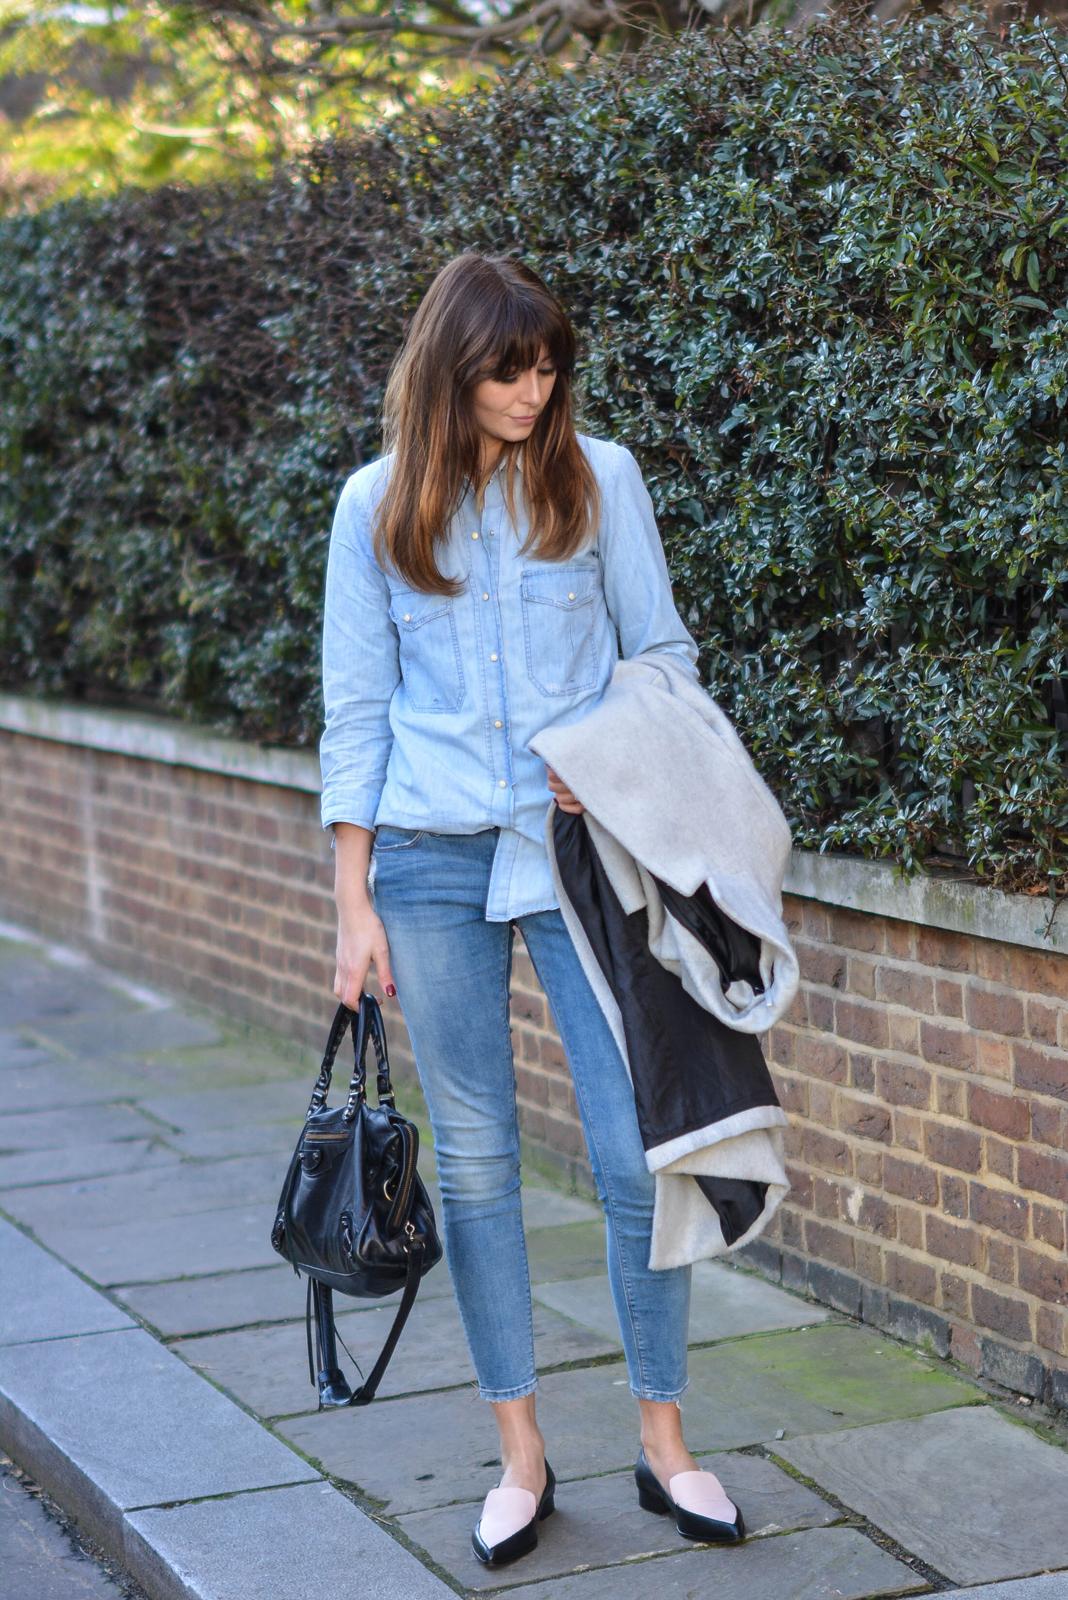 EJSTYLE - Emma Hill, Fashion blogger, Dorothy Perkins Grey coat, zara denim shirt, asos skinny jeans, double denim trend, SS15, John Lewis pointed loafers, black white pointed loafers, OOTD, street style